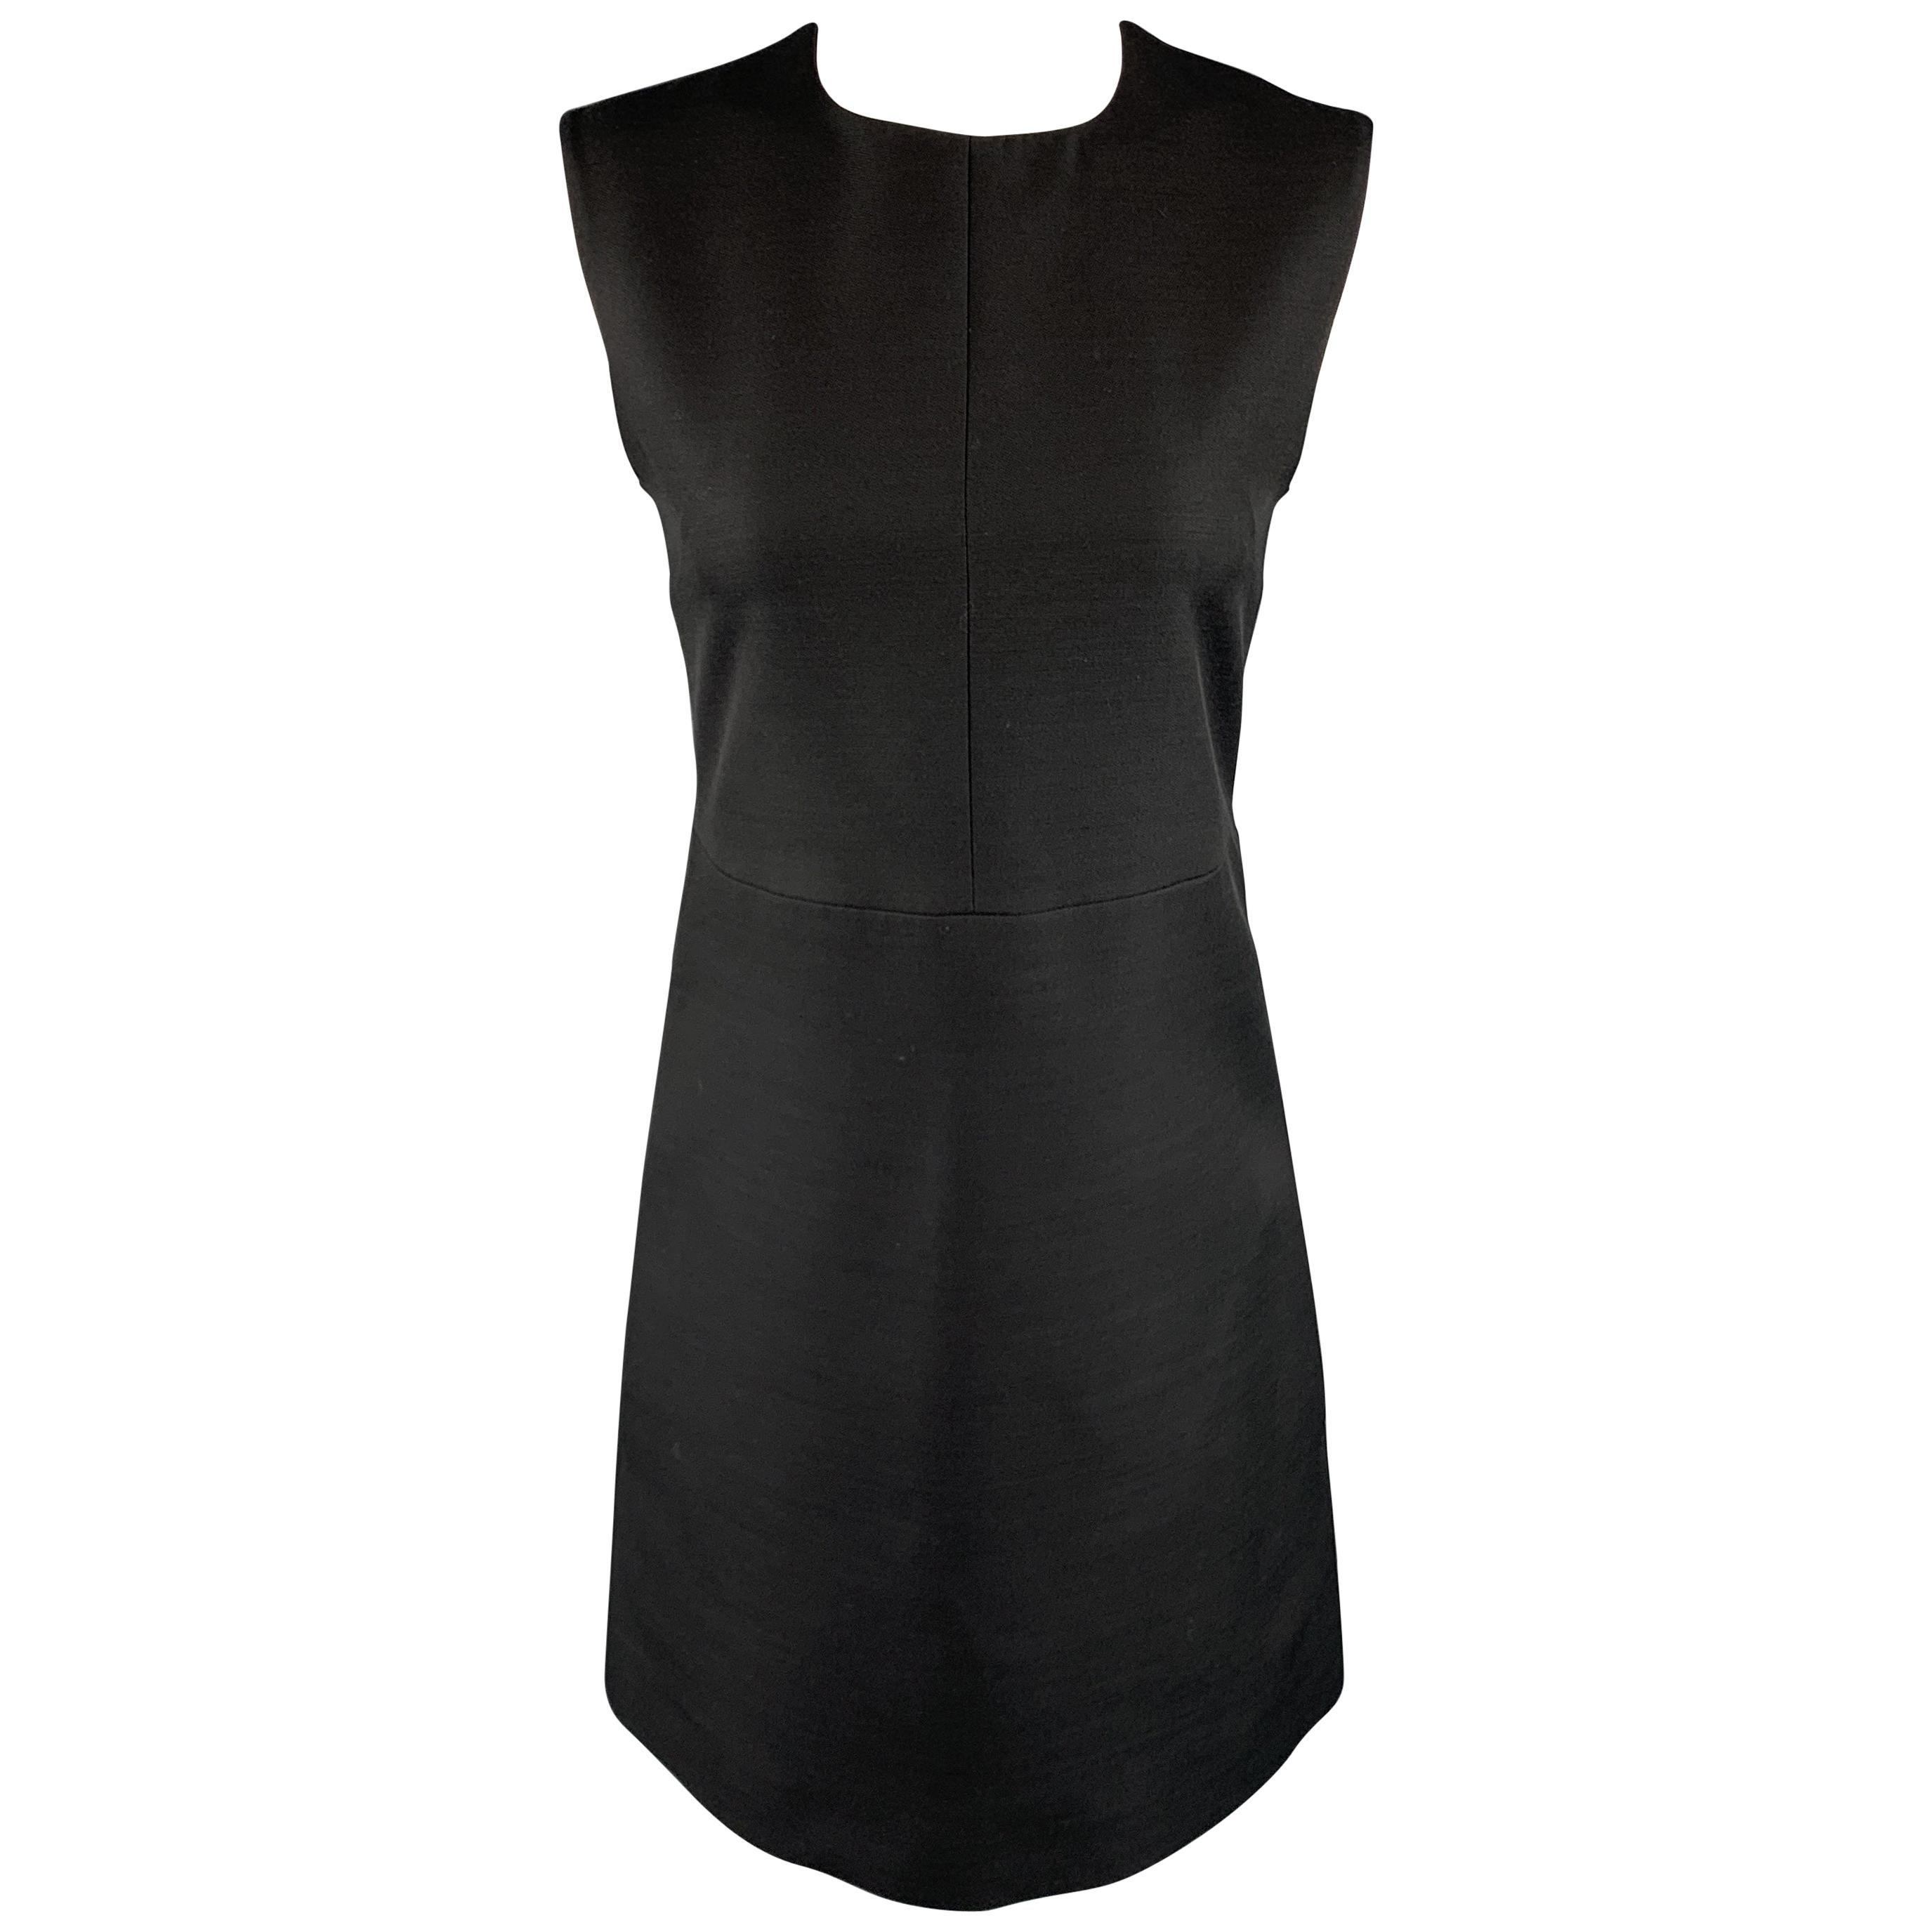 CELINE Size 2 Black Structured Sleeveless A Line Shift Dress